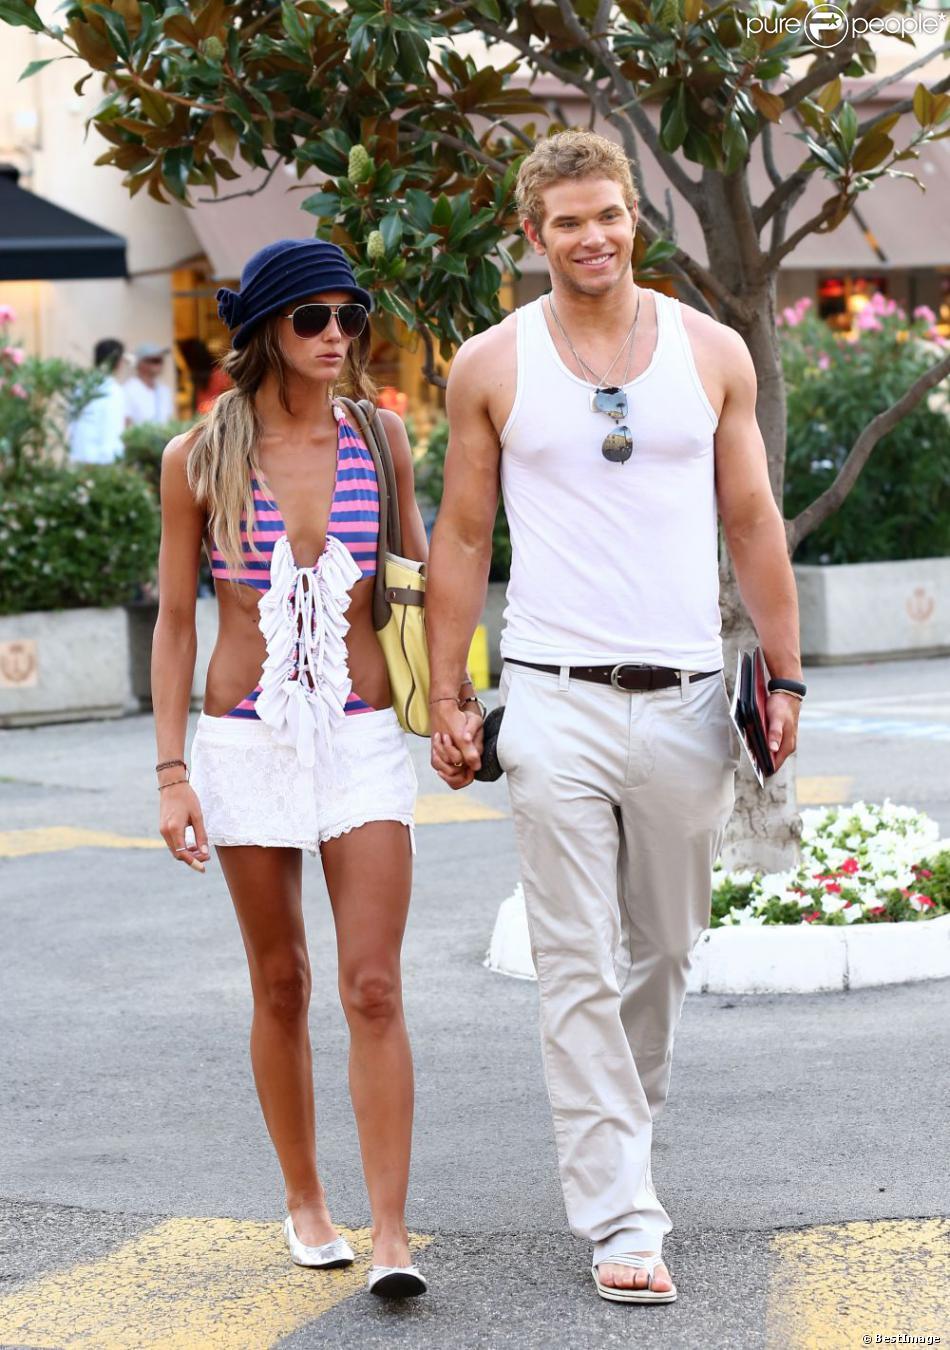 sharni vinson dating kellan lutz Prior to dating kellan, sharni was linked to csi: ny star aj buckley until 2008, while the twilight heartthrob romanced 90210's annalynne mccord through 2010  kellan lutz's ex sharni vinson.